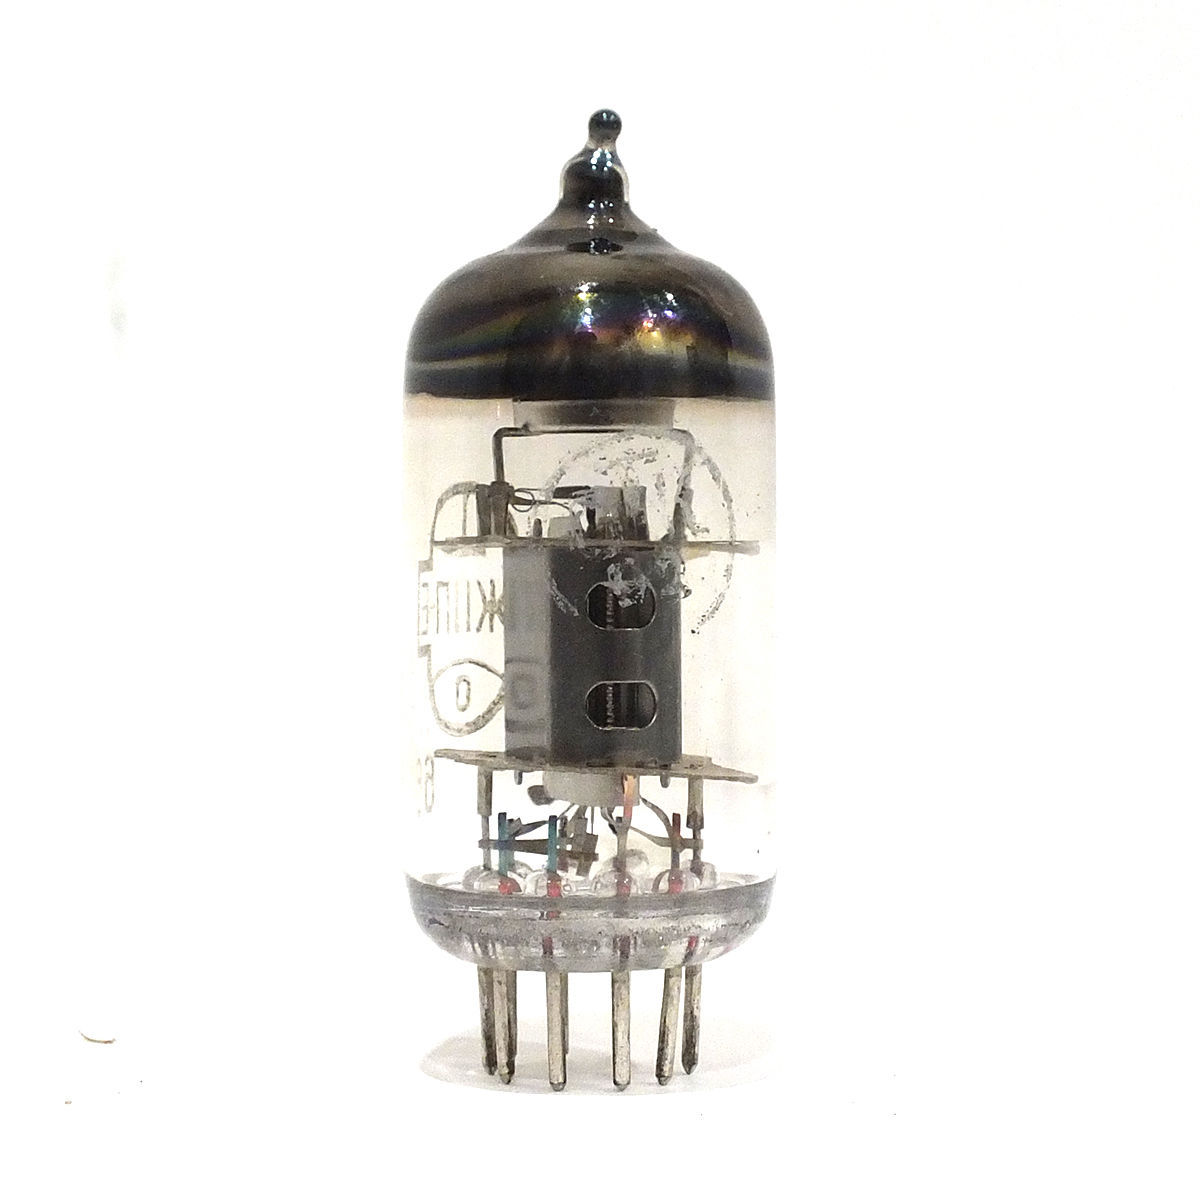 4 X 6J11P-E 6Zh11P-E = E180F 6688 = Military USSR Reflector tubes Same date 1980